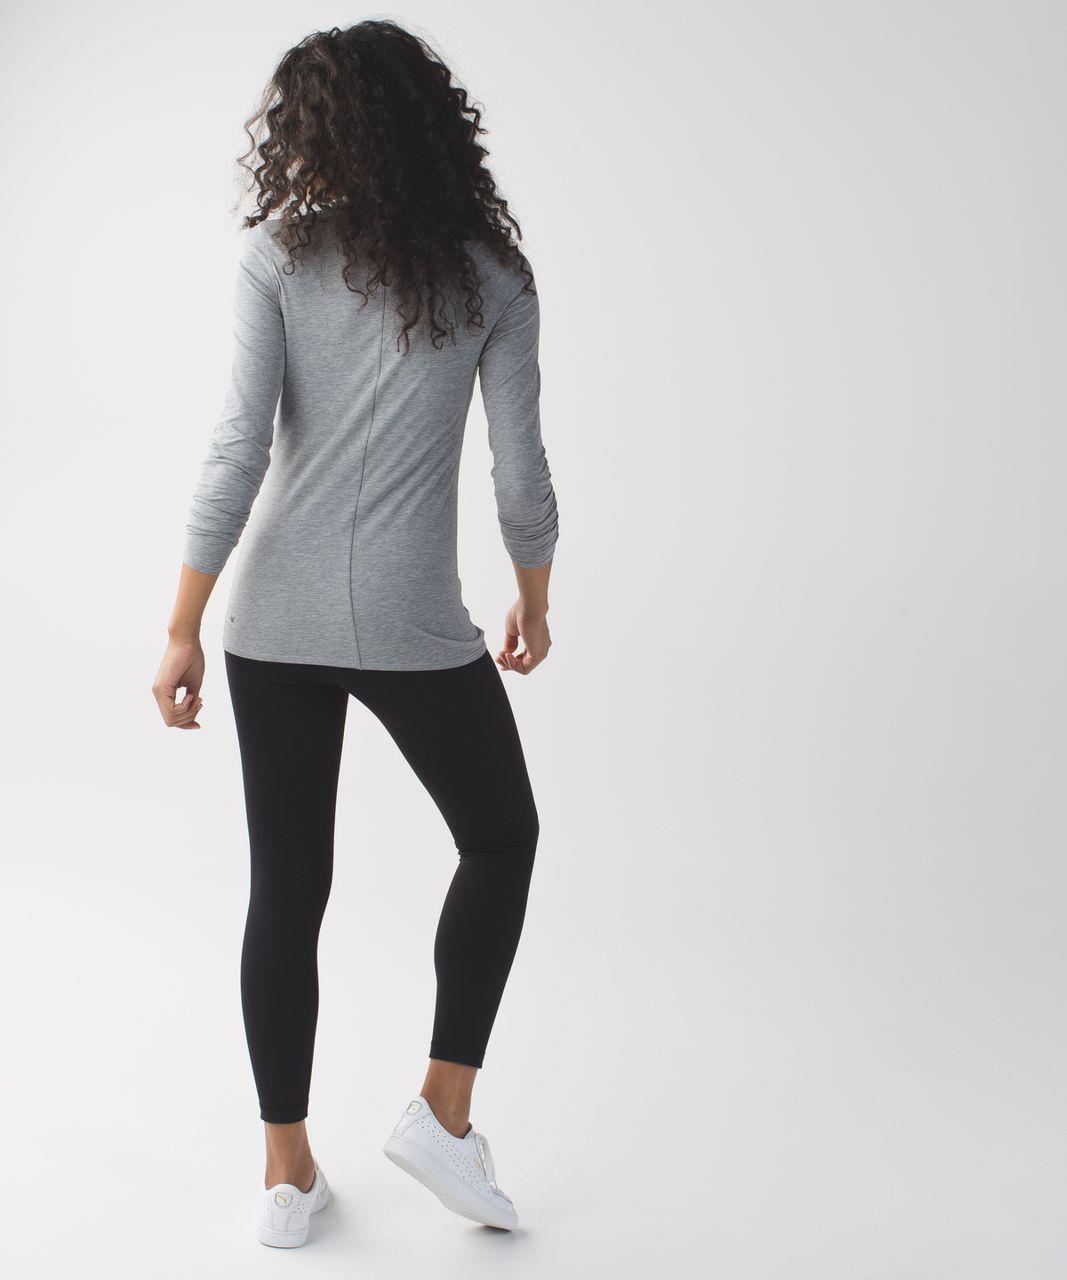 Lululemon Anahatasana Long Sleeve Tee - Heathered Medium Grey